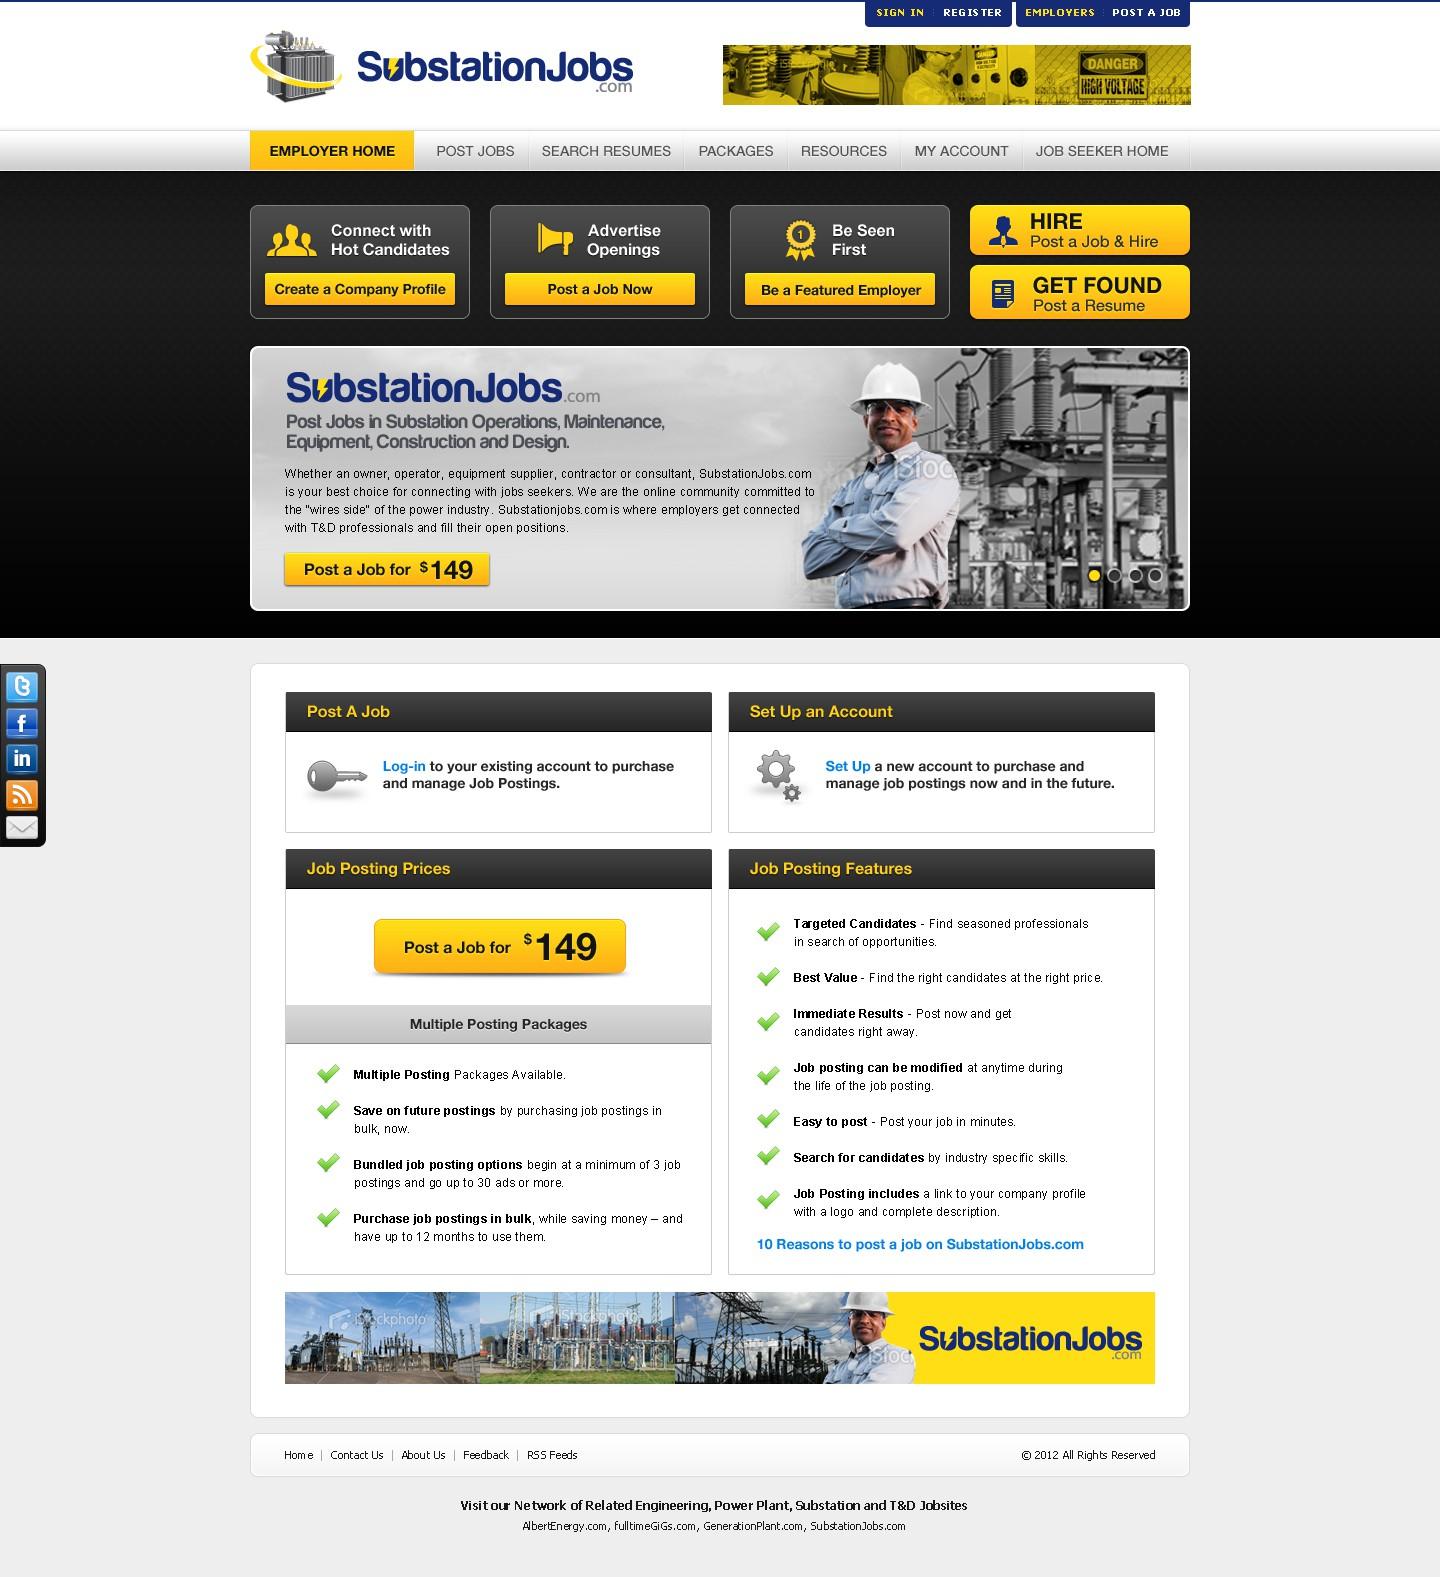 Help SubstationJobs.com with a new website design